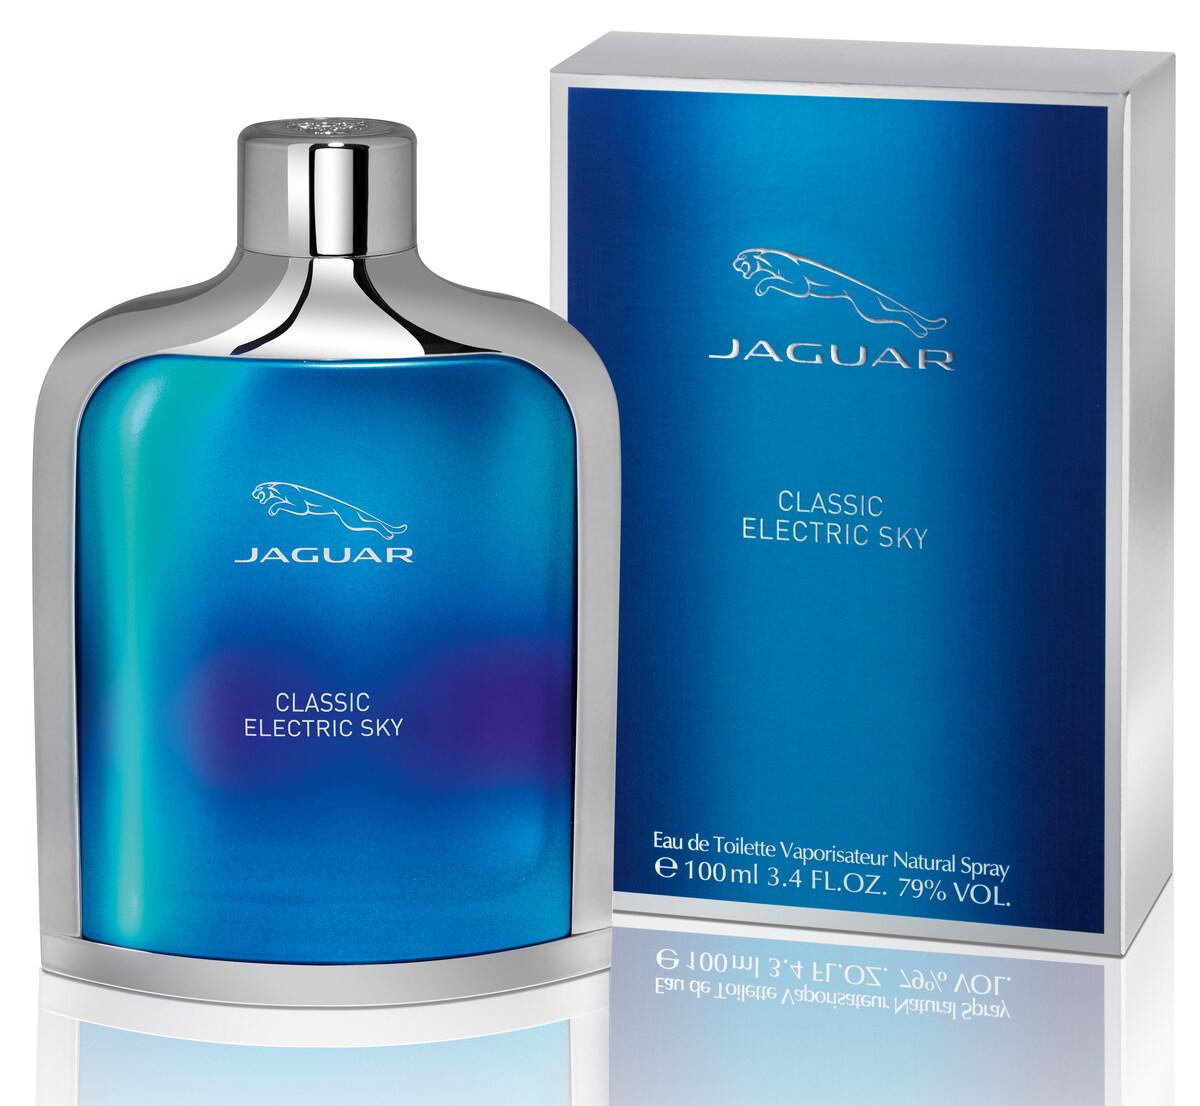 Jaguar | Jaguar Classic Electric Sky Eau de Toilette 100ml